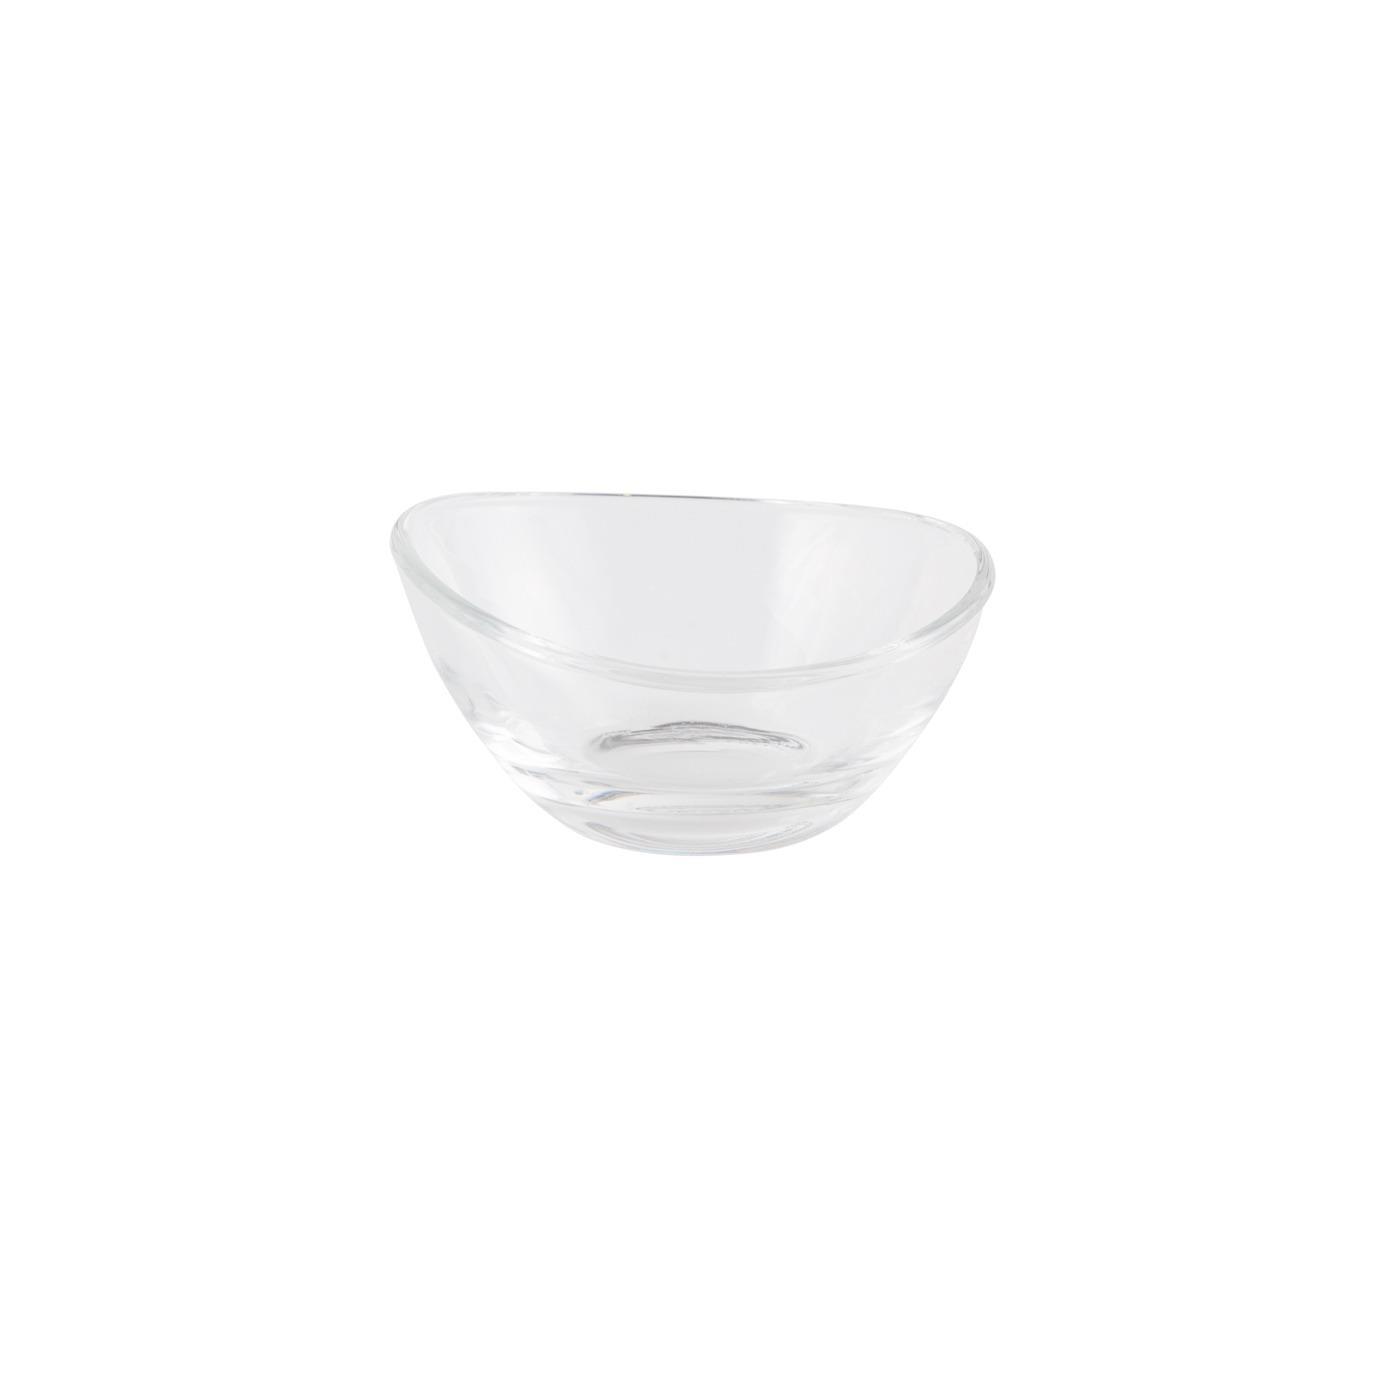 "Glass Papaya Bowl - 3.25"""